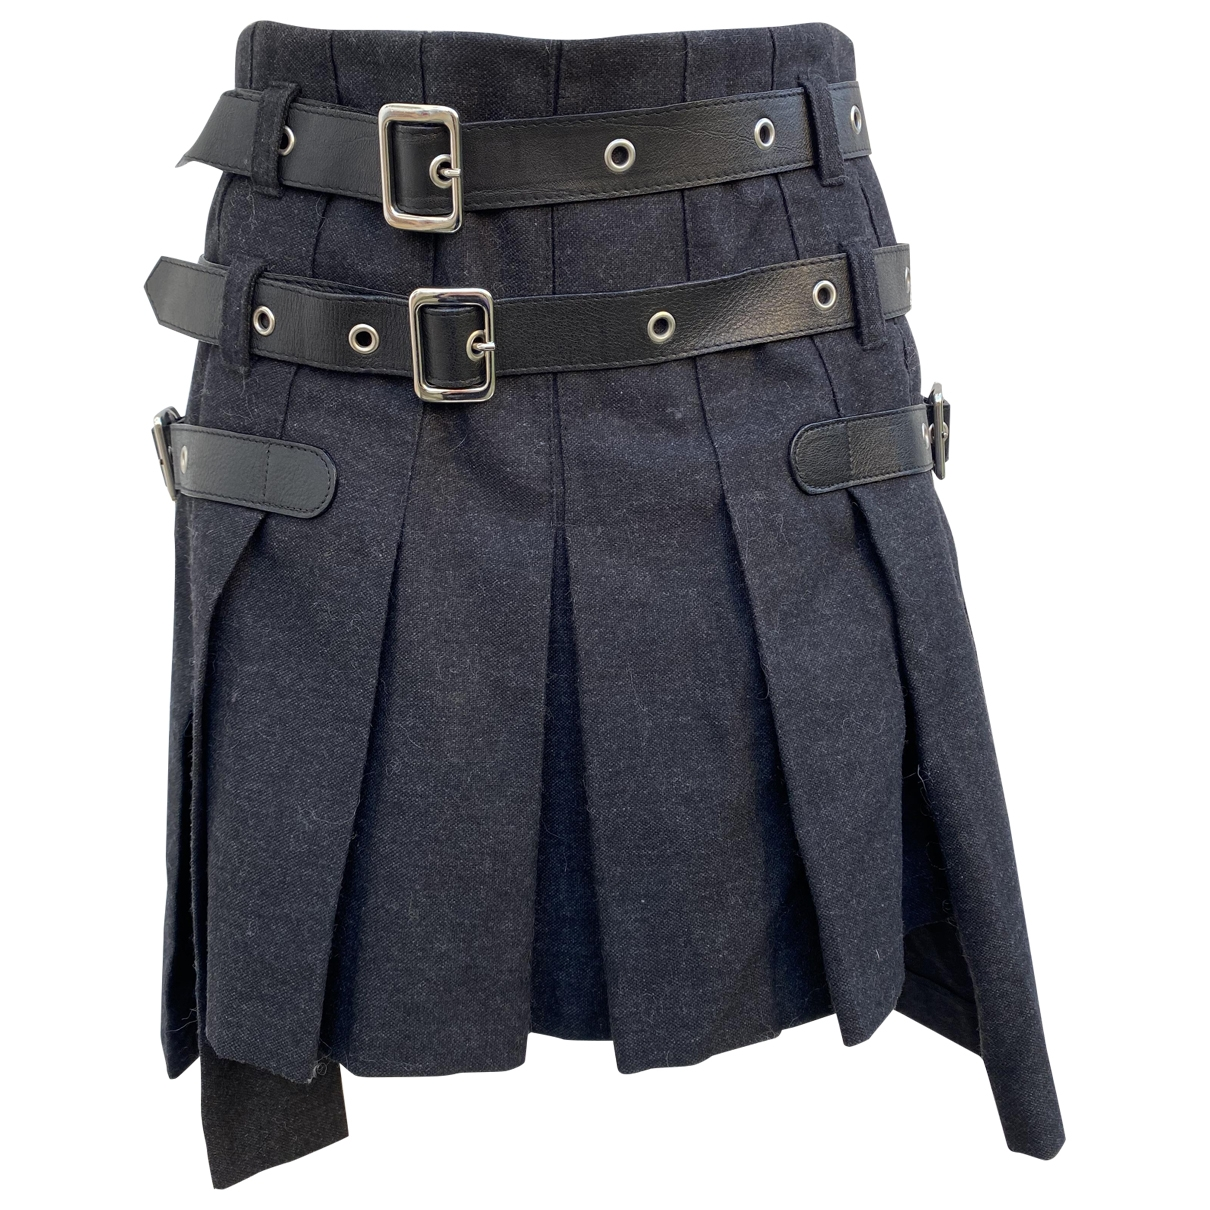 D&g \N Anthracite Wool skirt for Women 42 IT